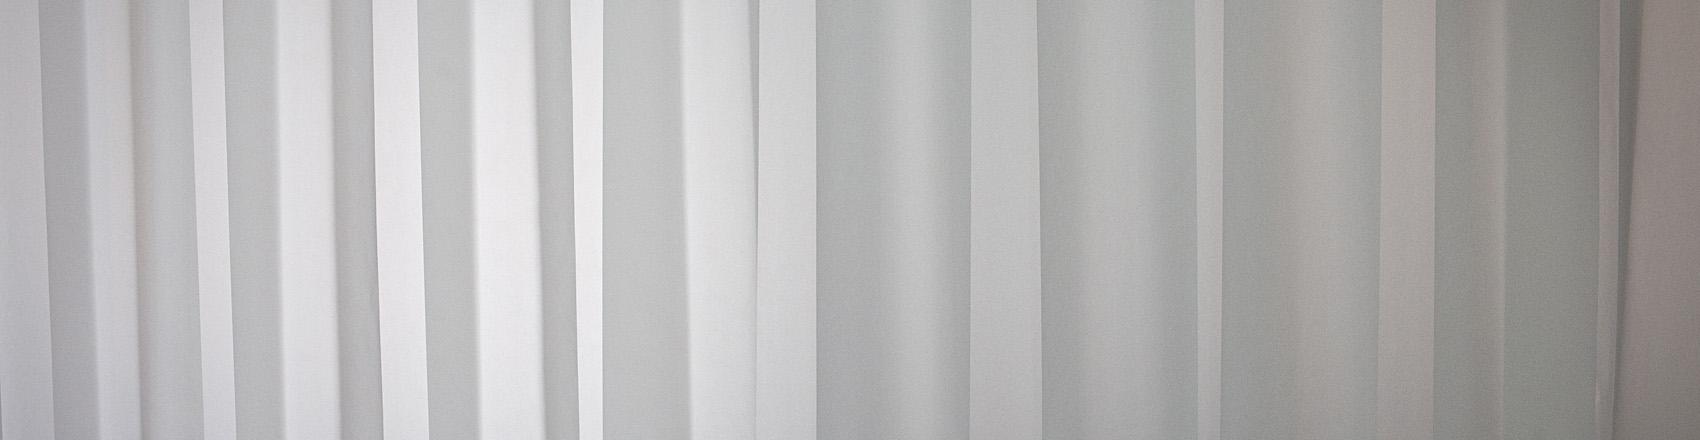 WiH_Leibnizsaal_Marta-Krajinović_slider